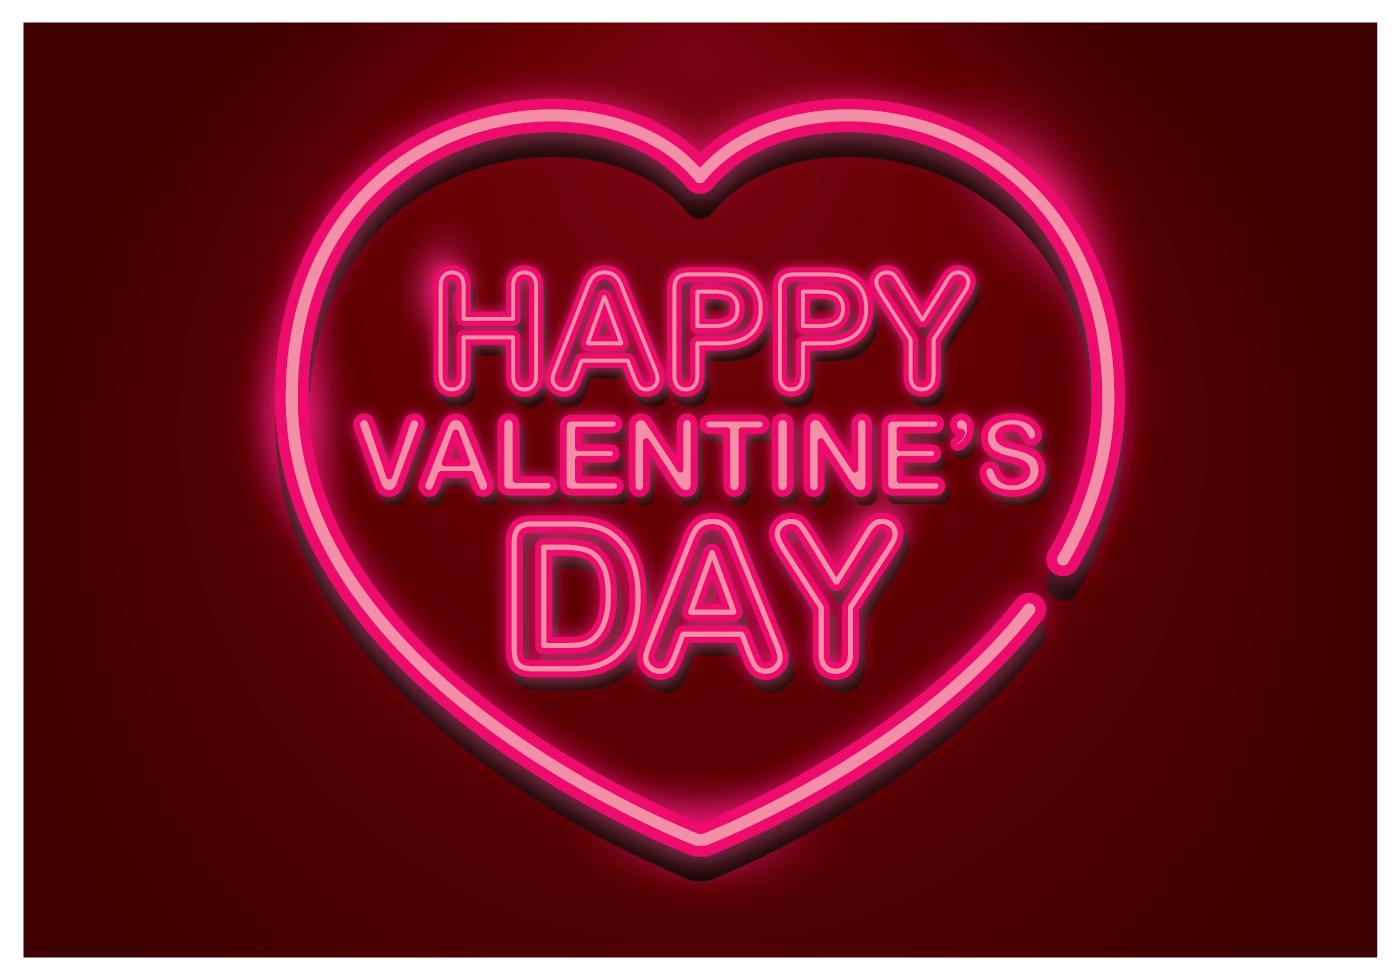 Happy Valentines Day Free Vector Art - (32293 Free Downloads)